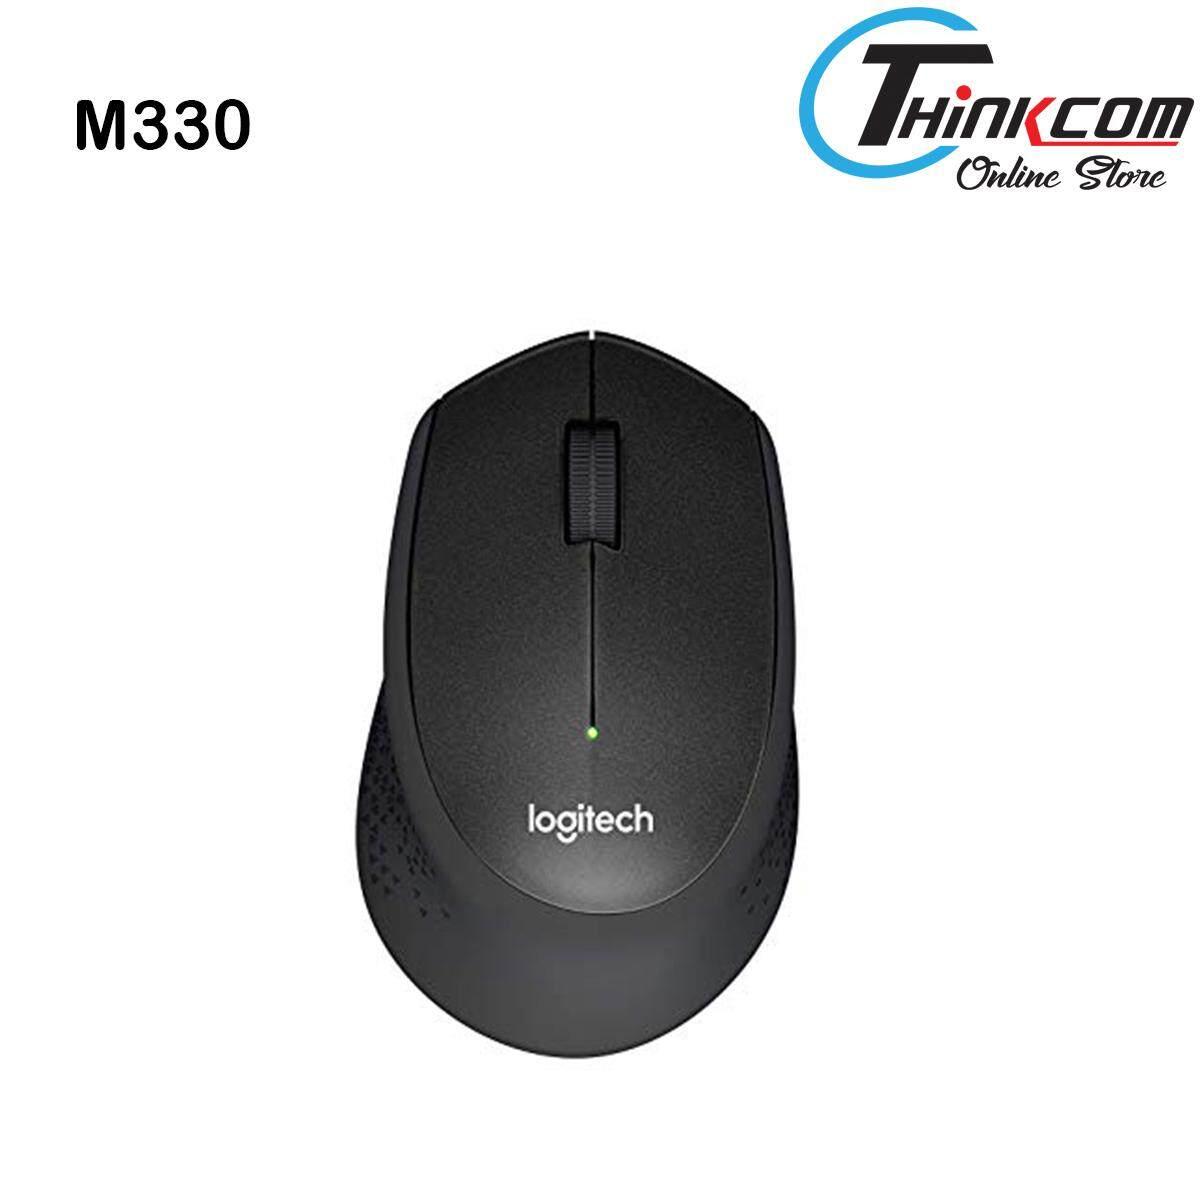 Logitech Wireless Mouse M330 Silent Plus (OEM) - 1 Year 1 To 1 Exchange Warranty Malaysia